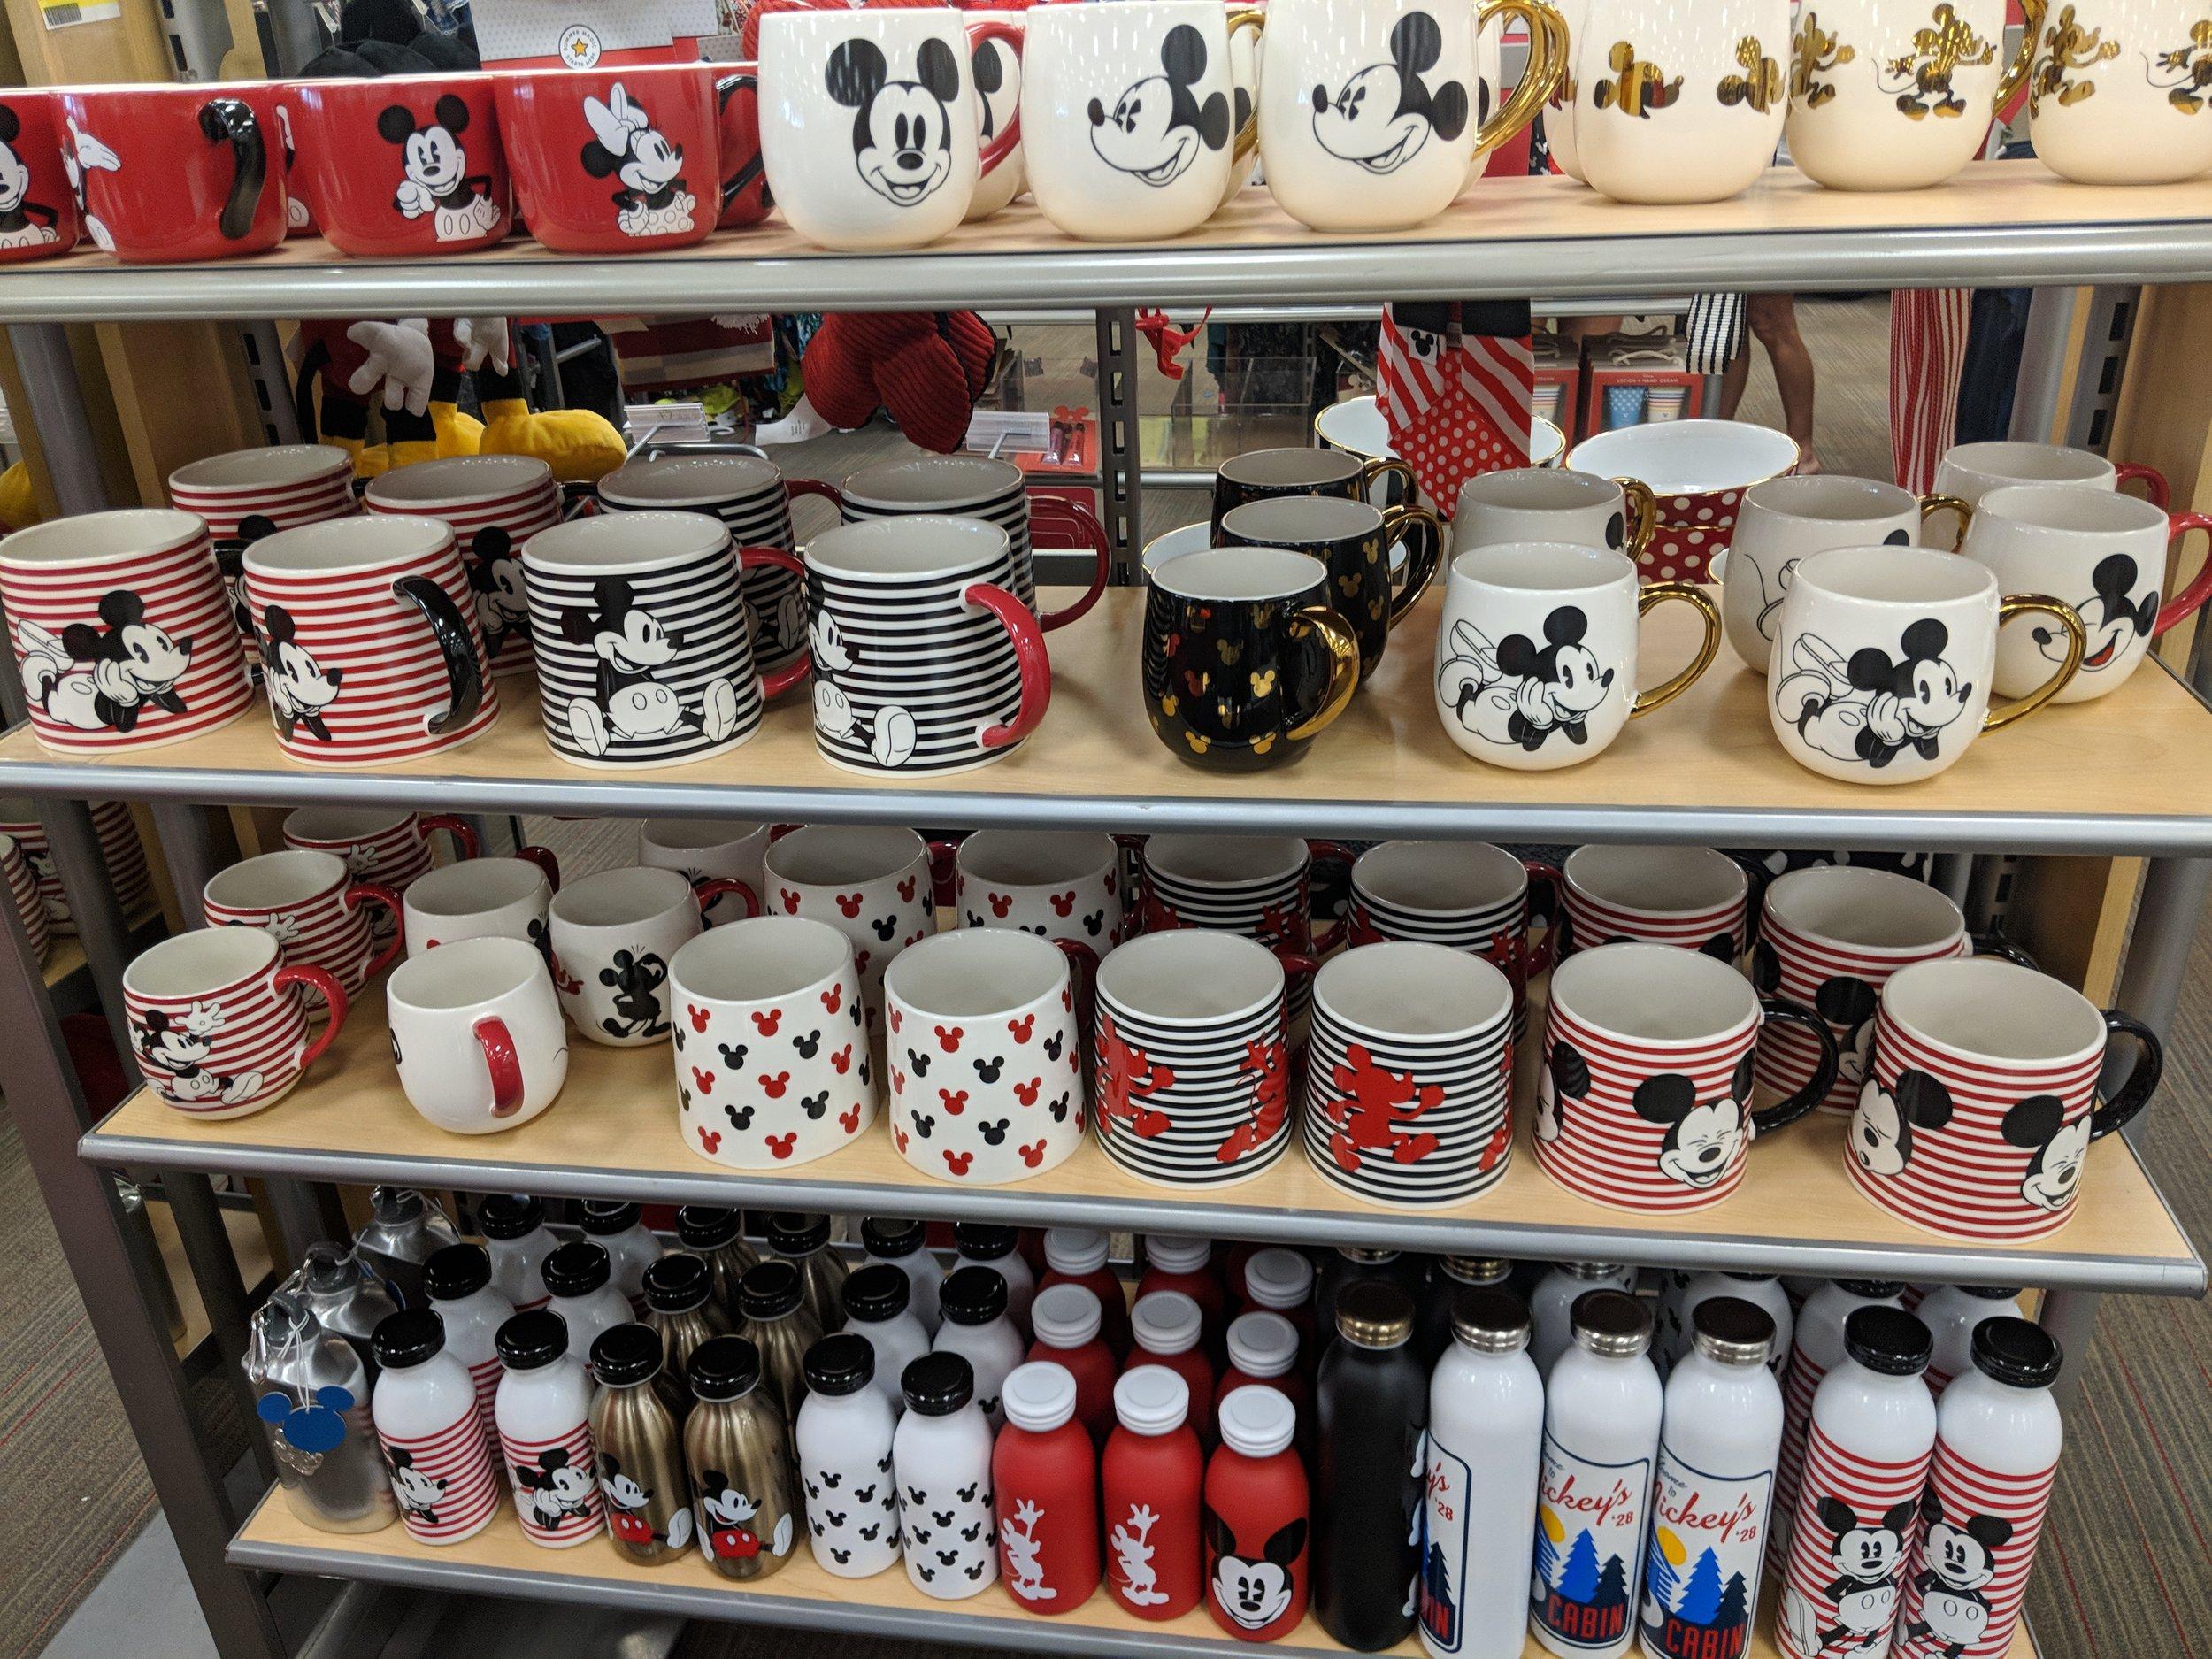 Mugs, mugs and more mugs!